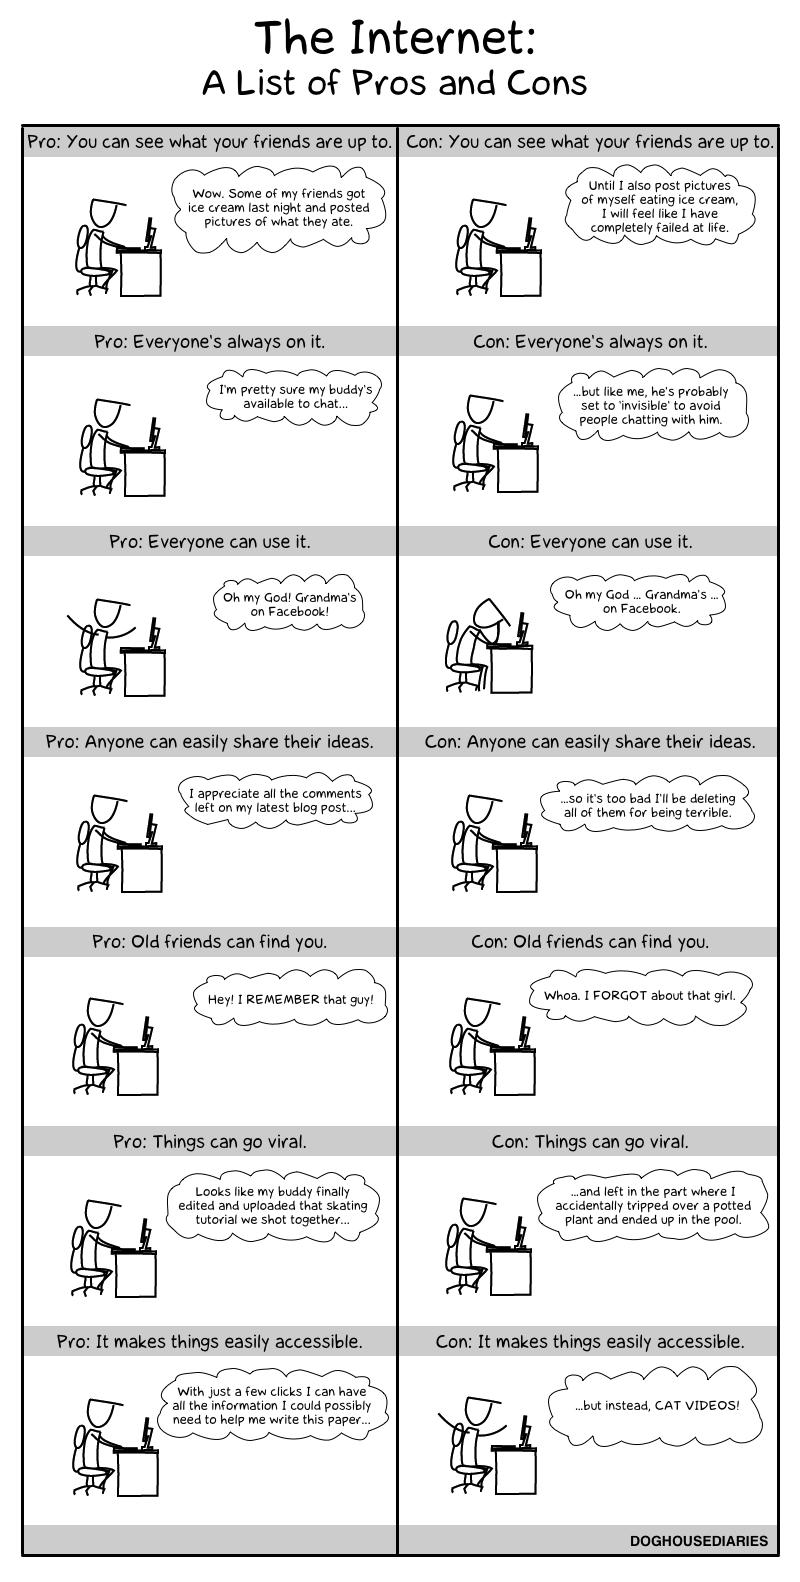 internet_pros_cons_comic